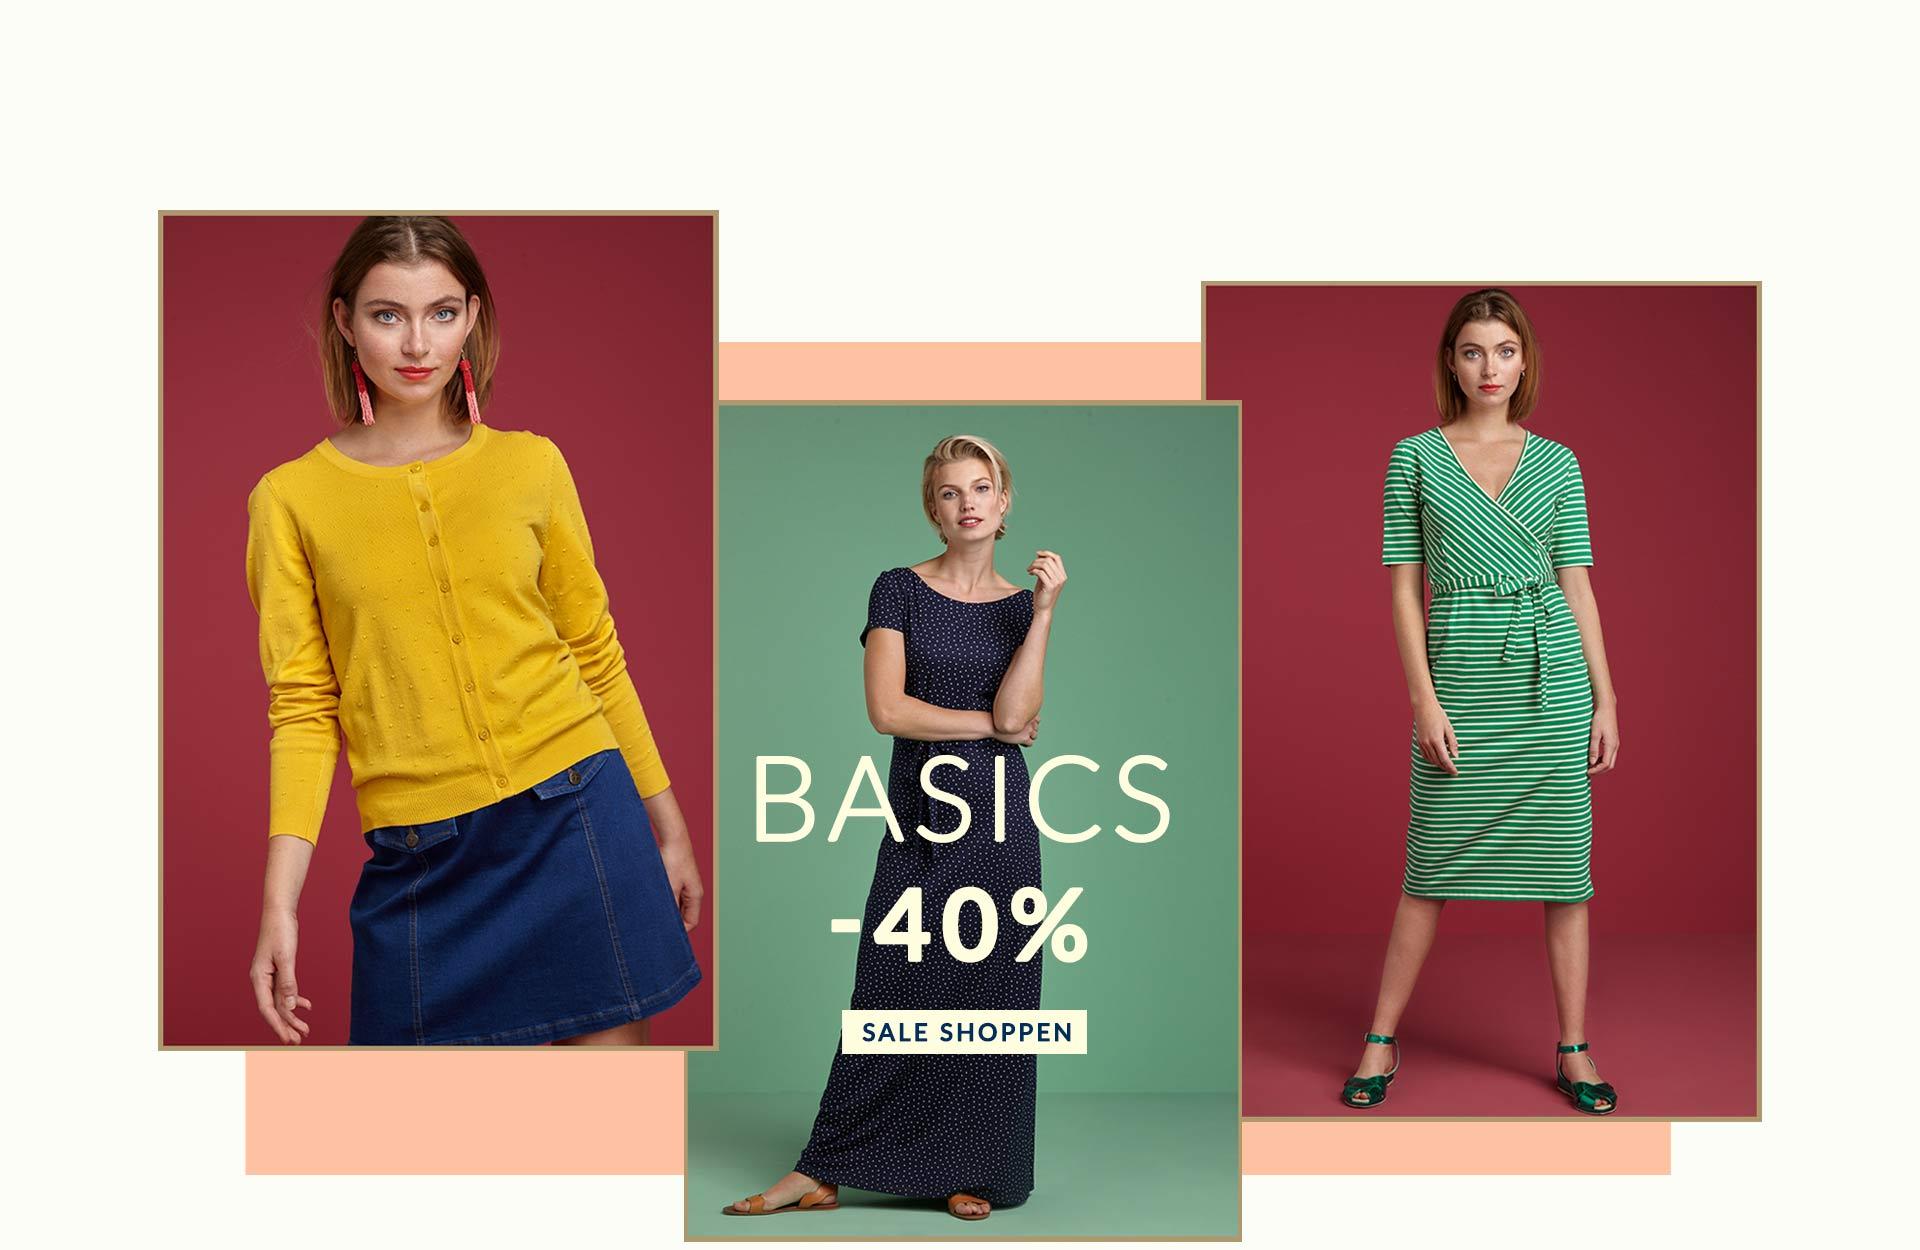 Basics 40% sale